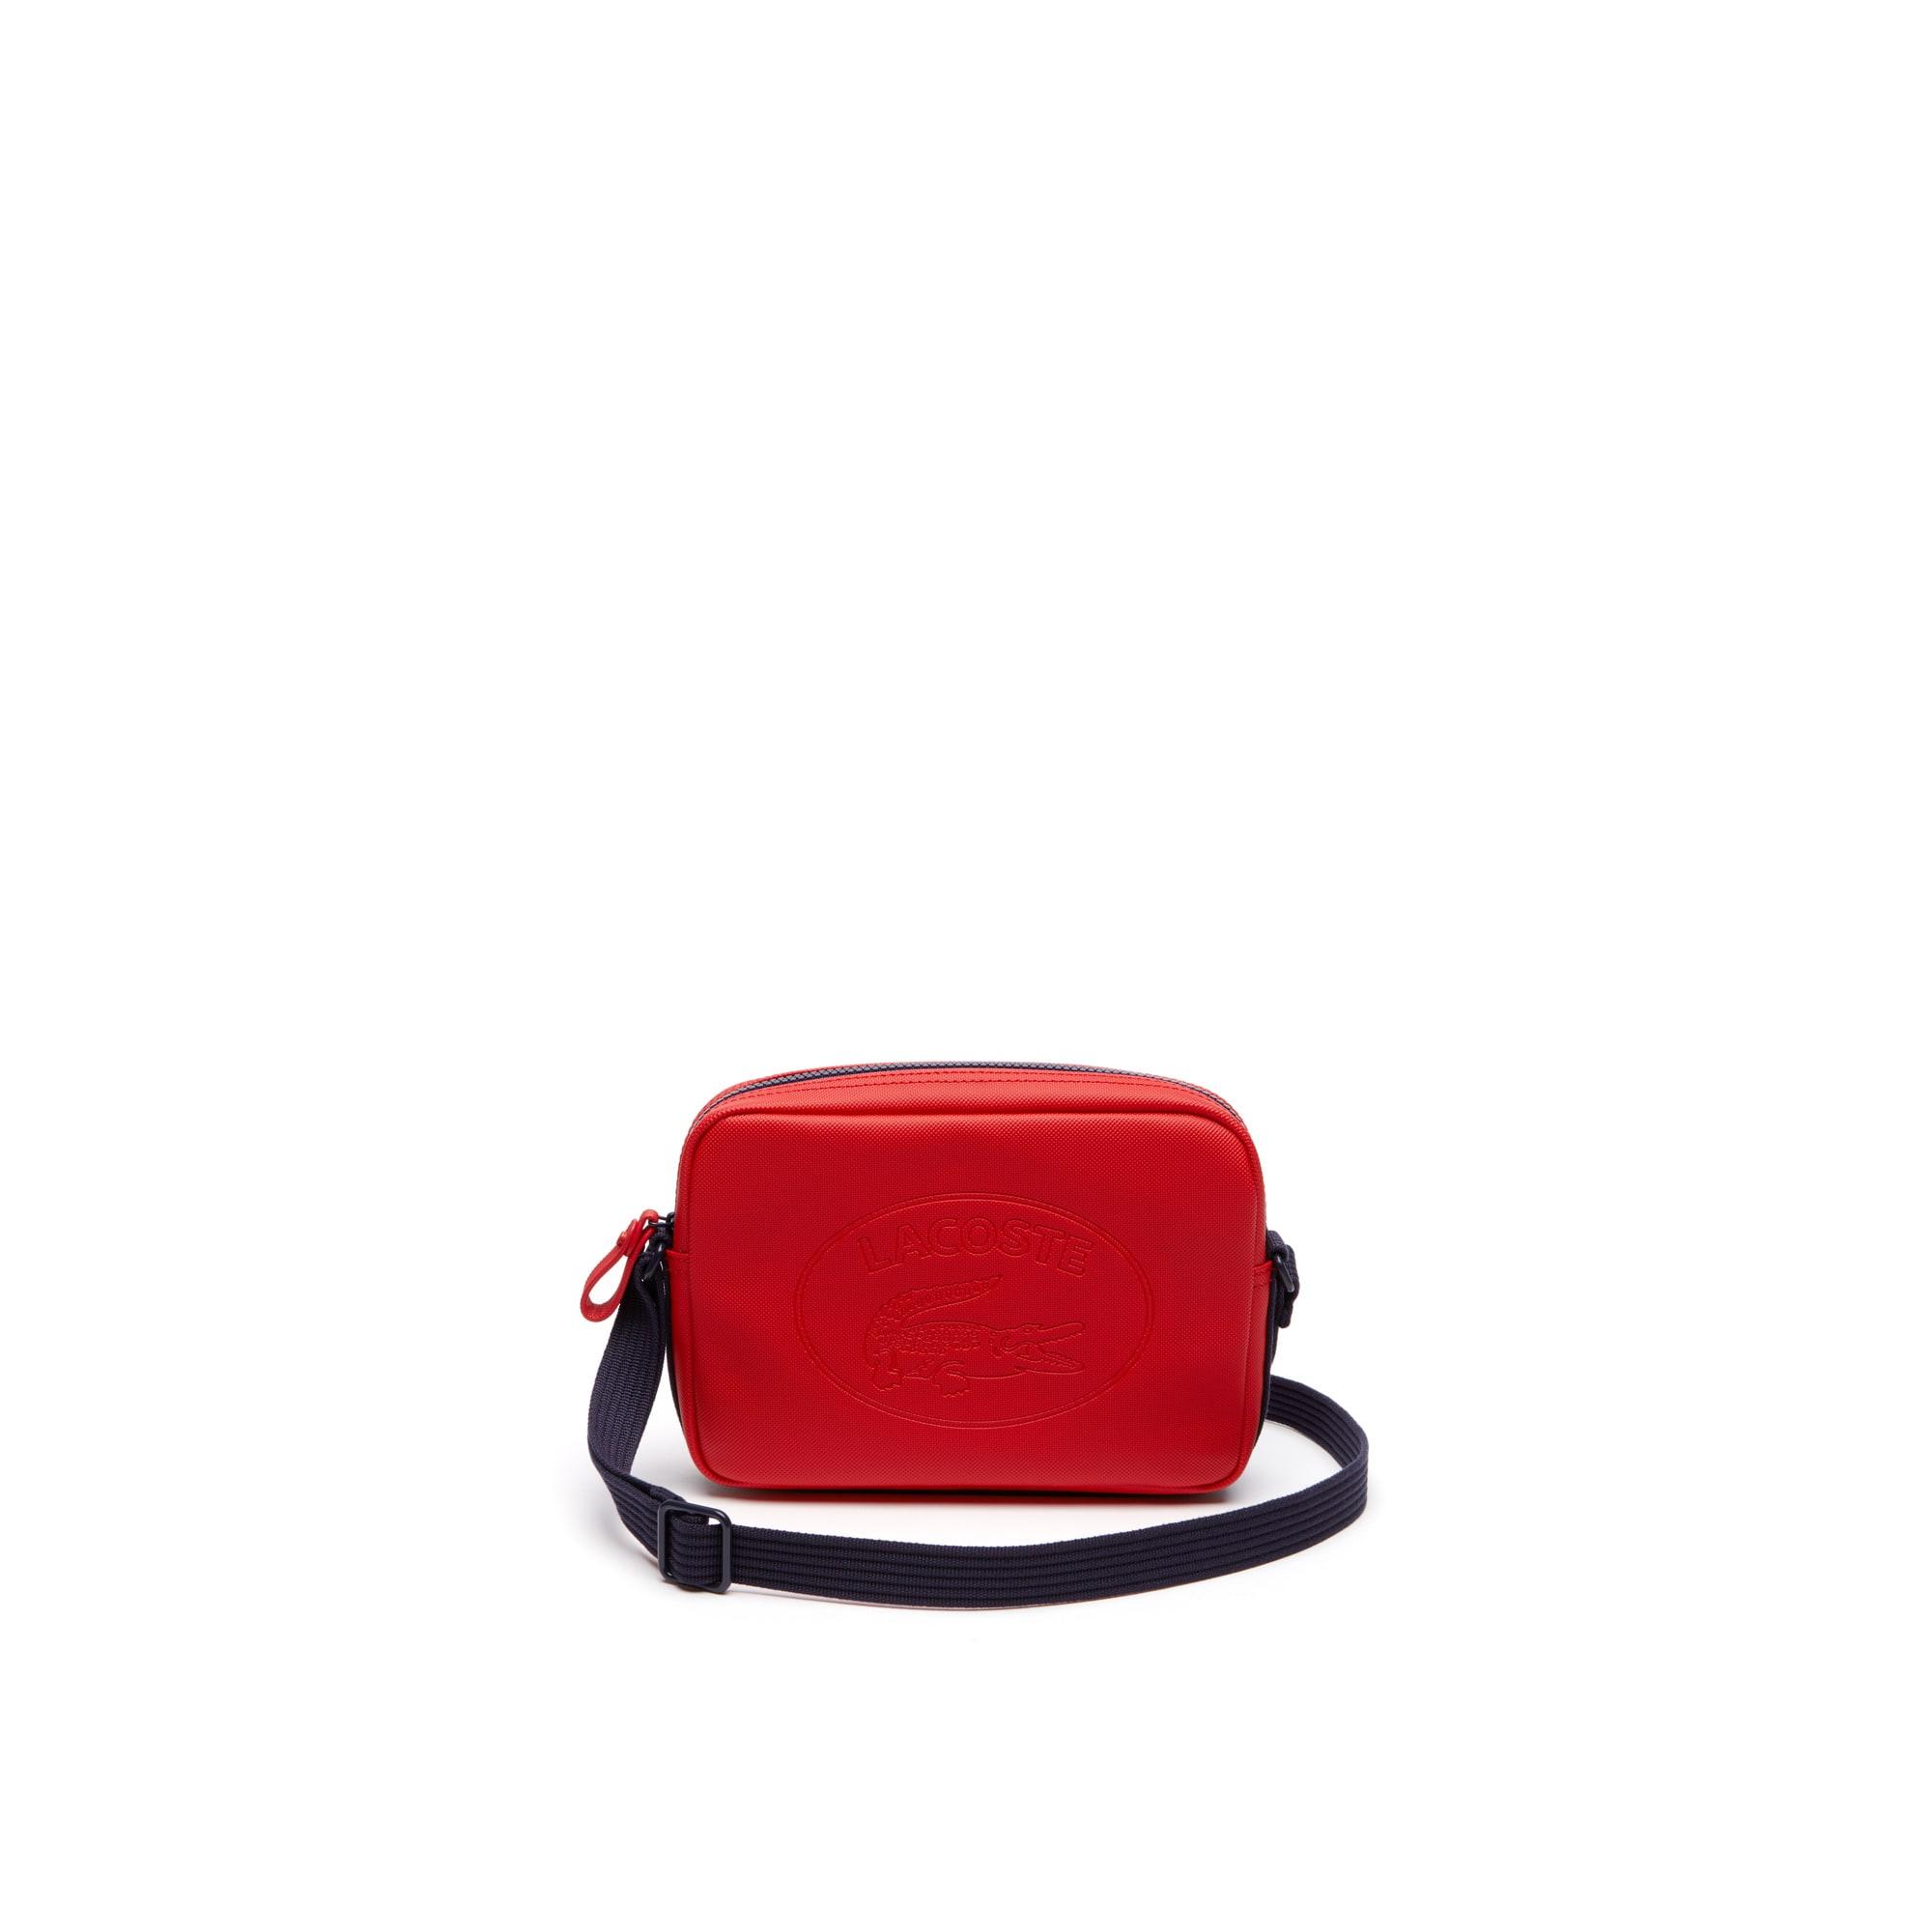 Women's Classic Coated Piqué Canvas Square Zip Crossover Bag